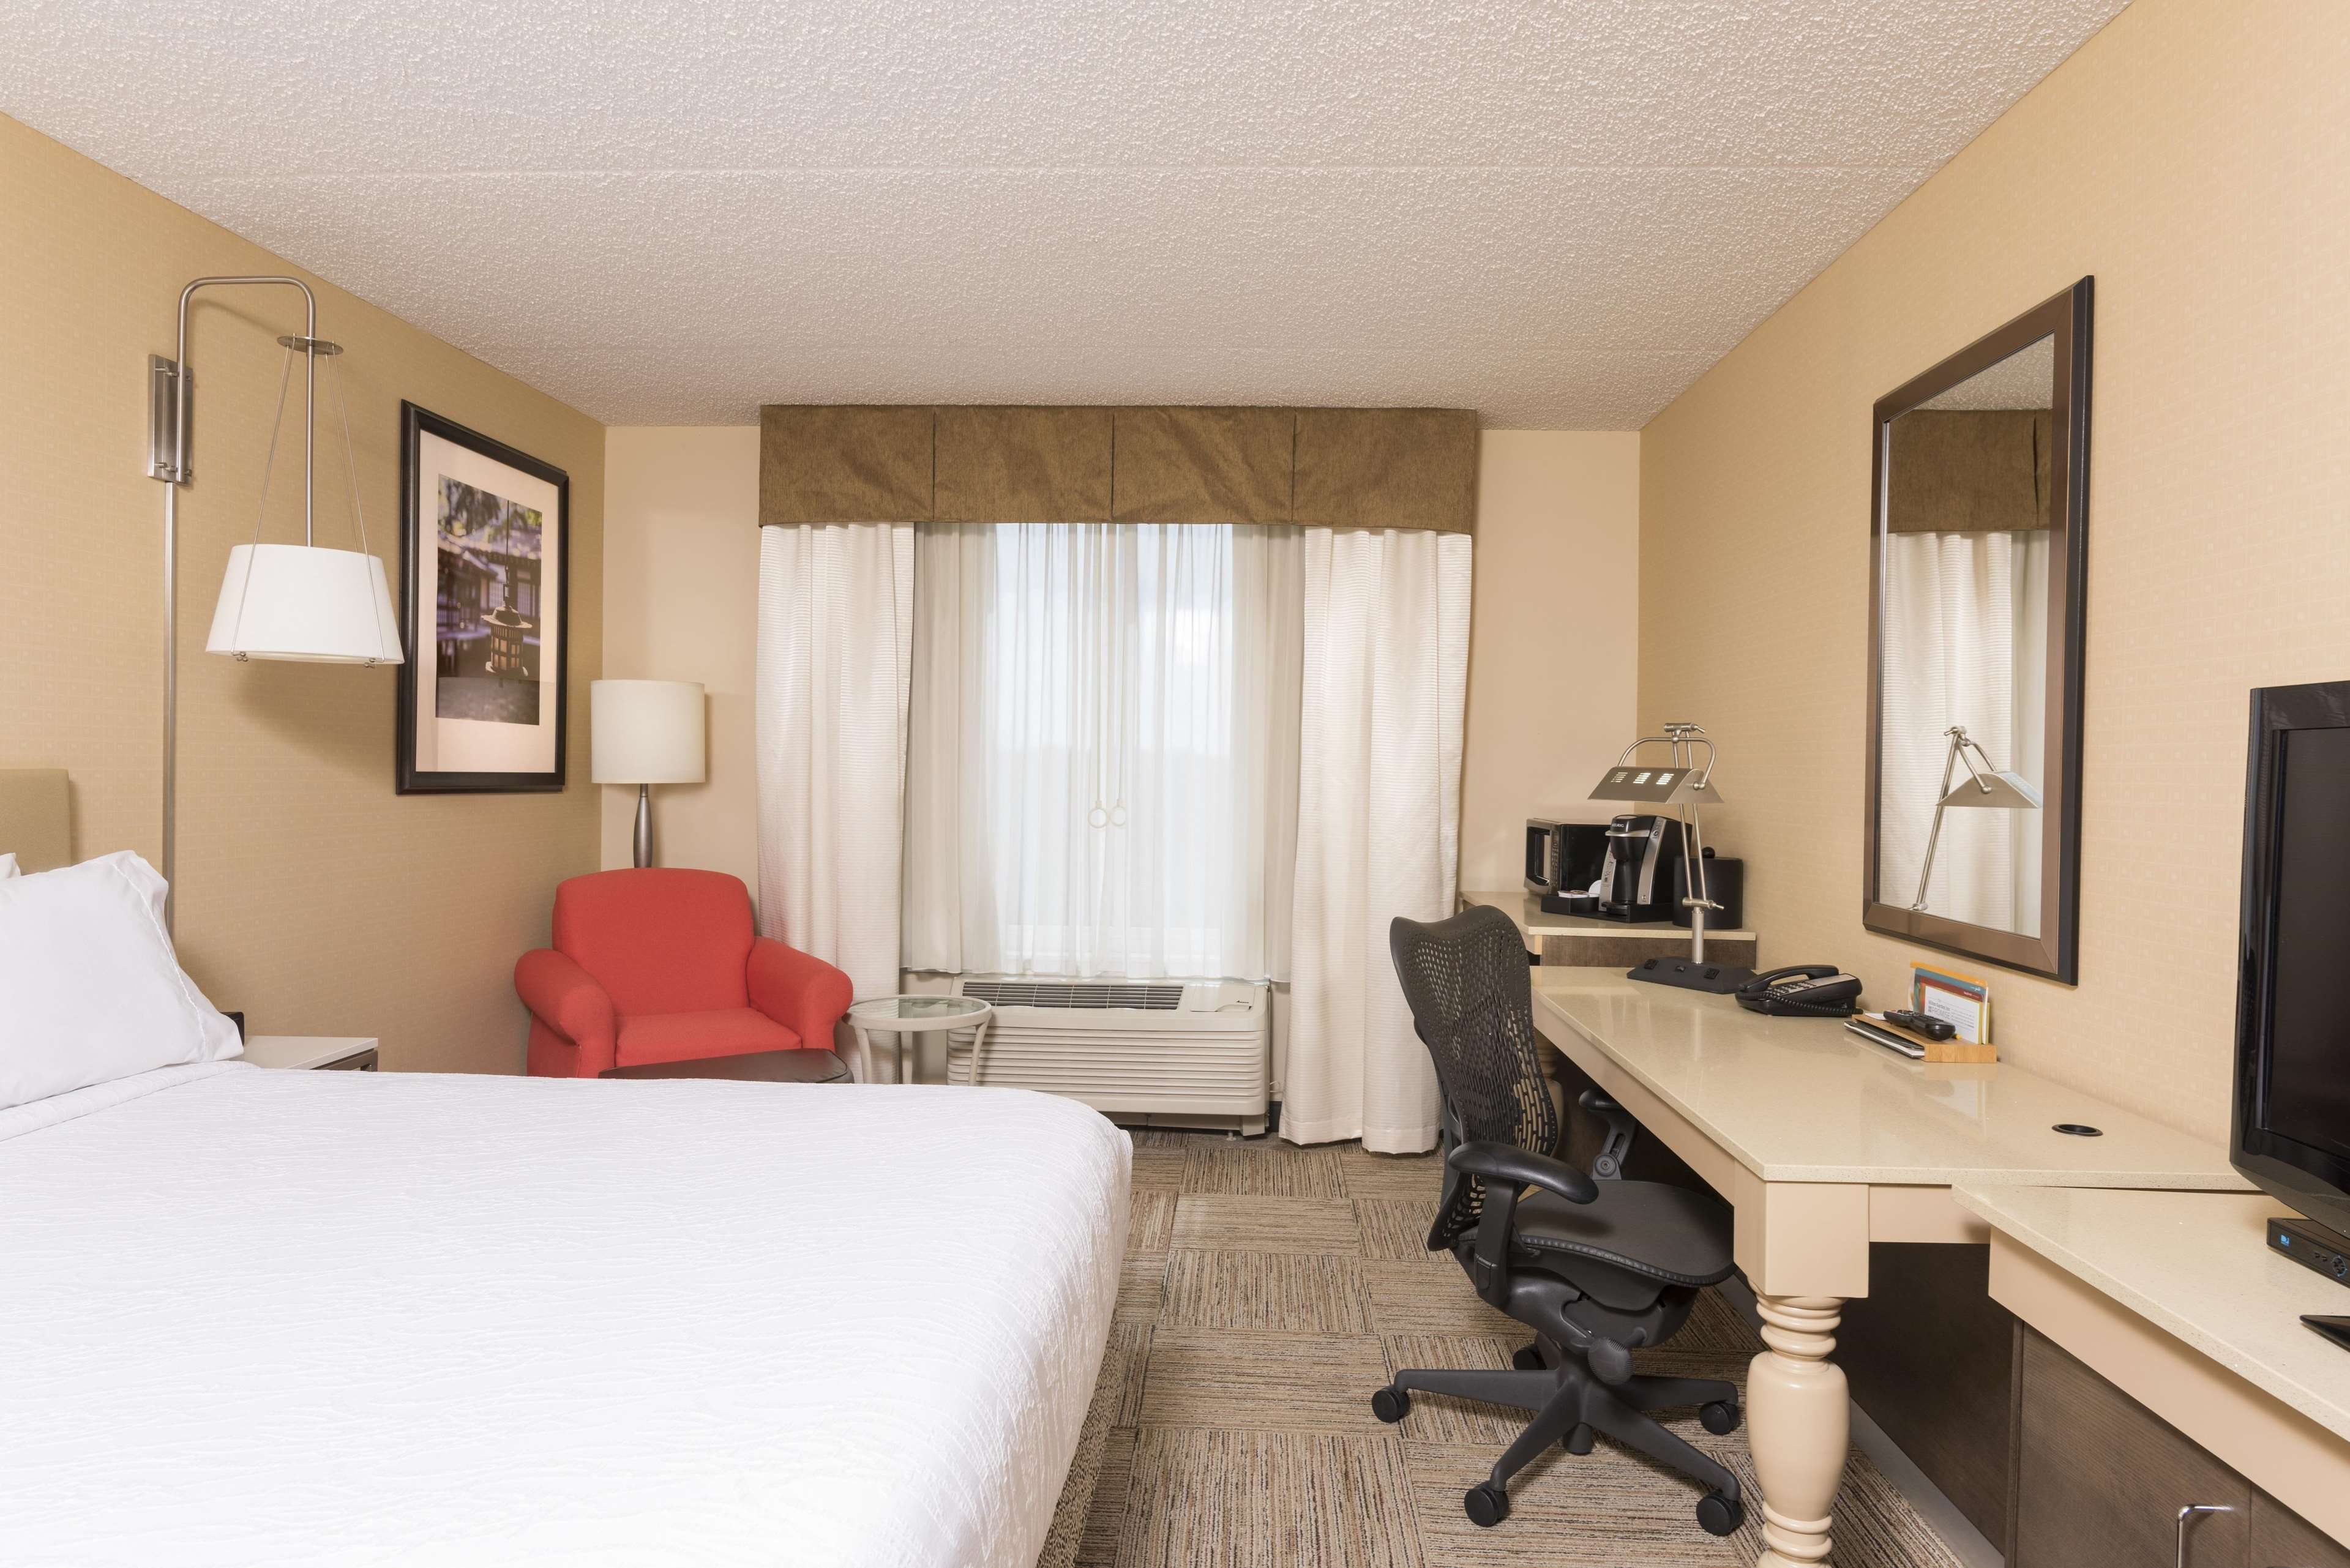 Hilton Garden Inn West Lafayette Wabash Landing image 17